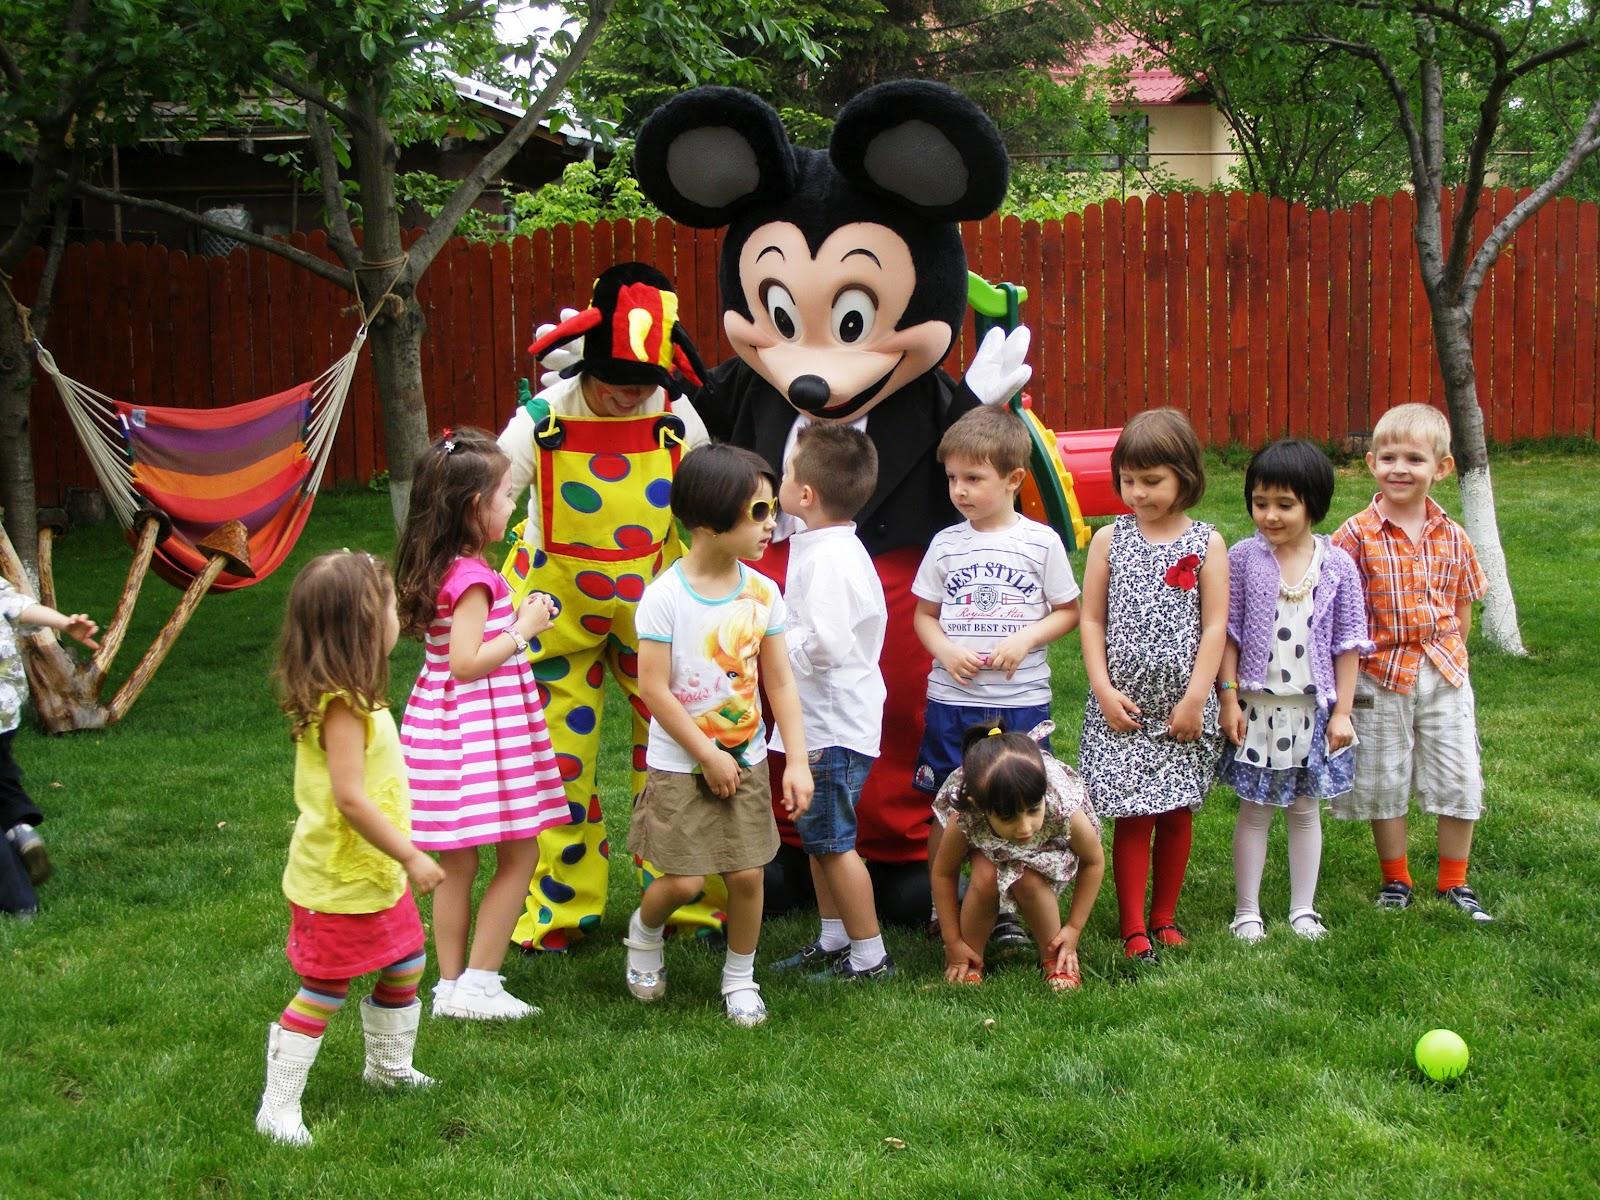 petreceri copii in aer liber